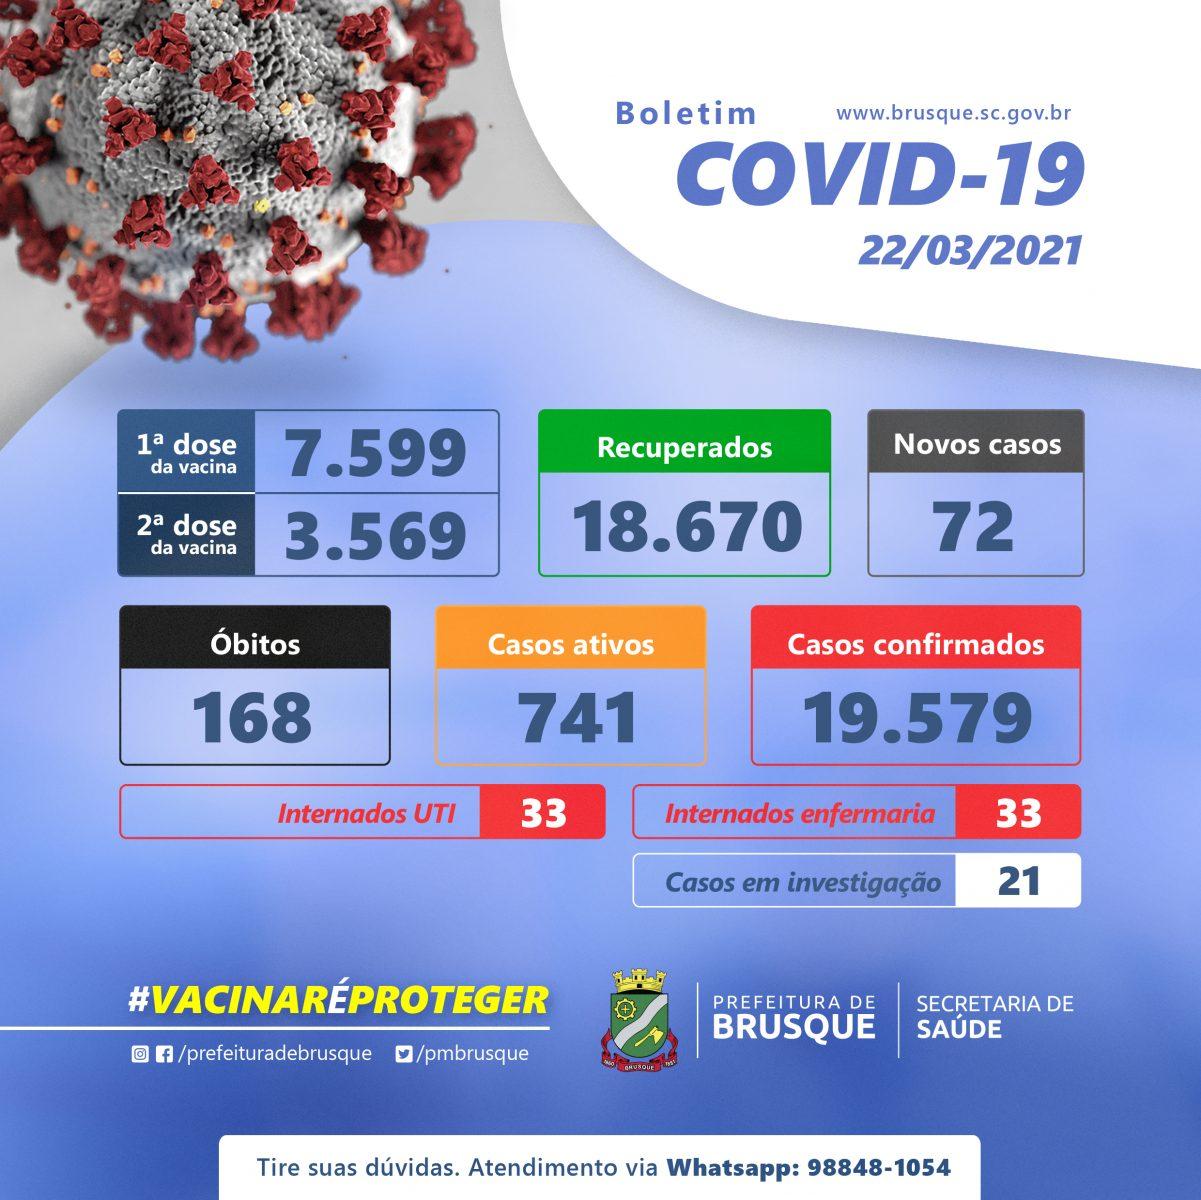 Covid-19: Confira o boletim epidemiológico desta segunda-feira (22)